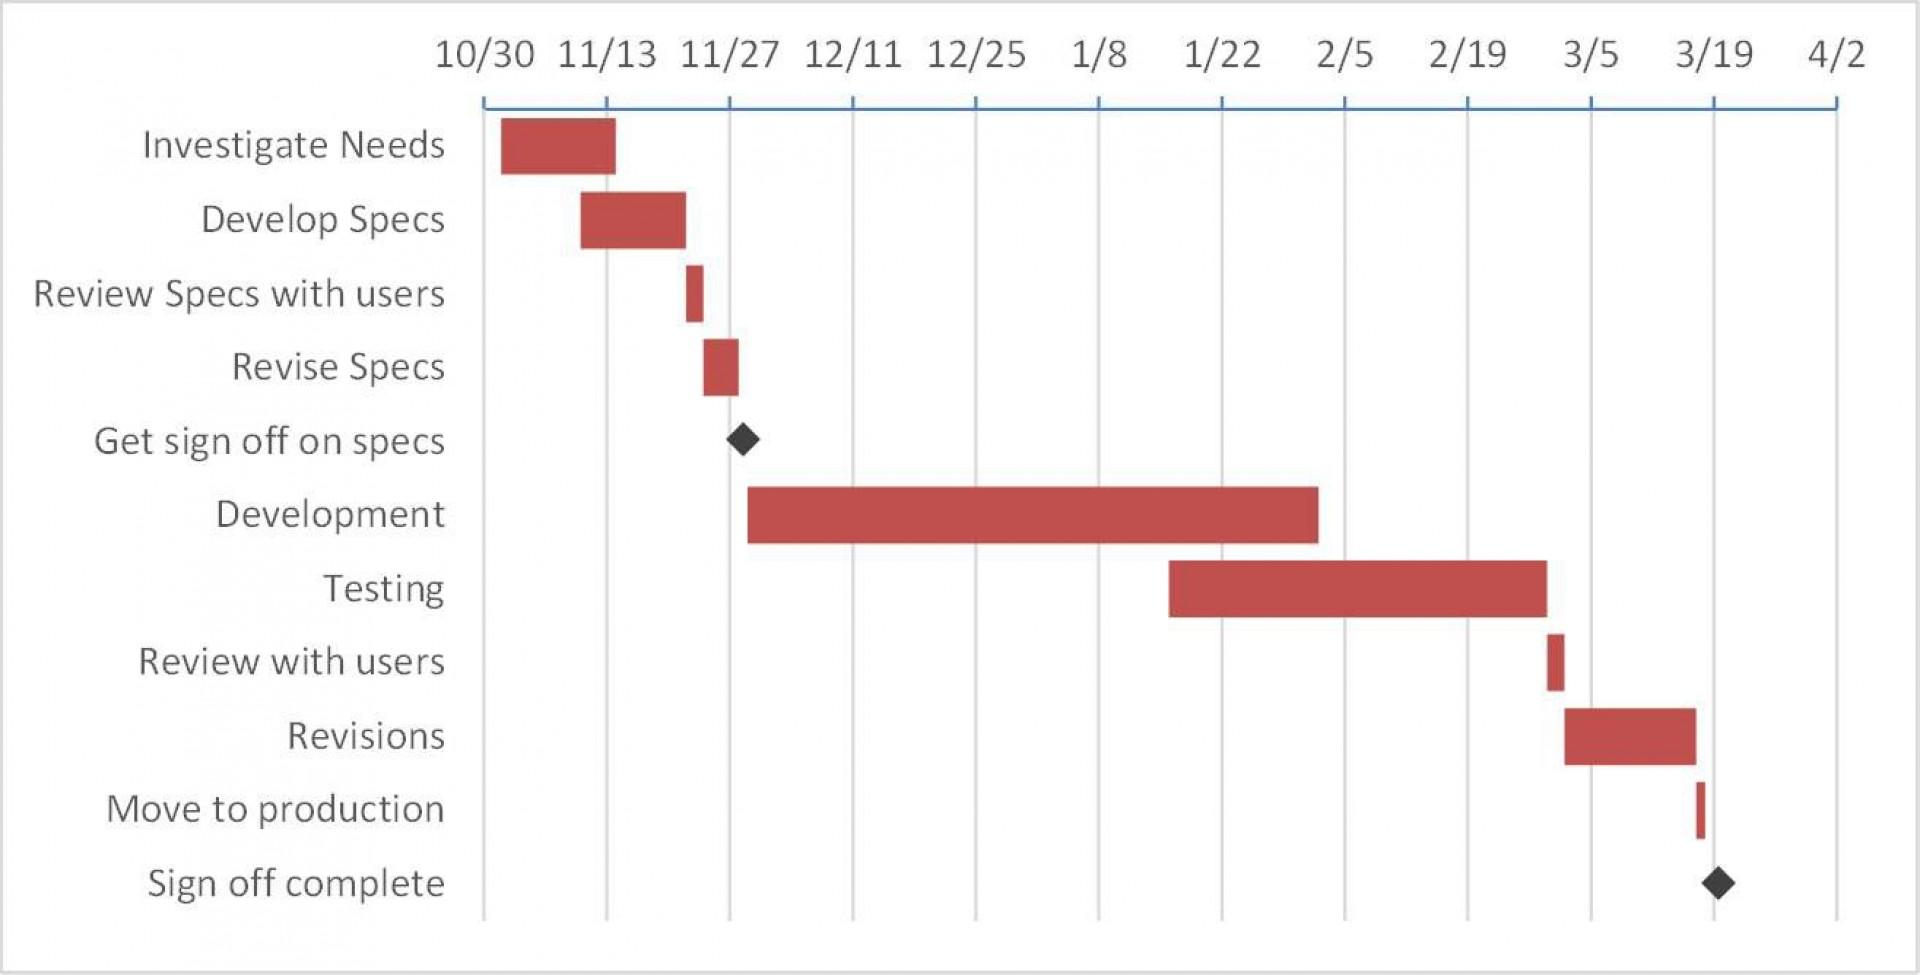 006 Impressive Project Gantt Chart Template Excel Free Photo 1920